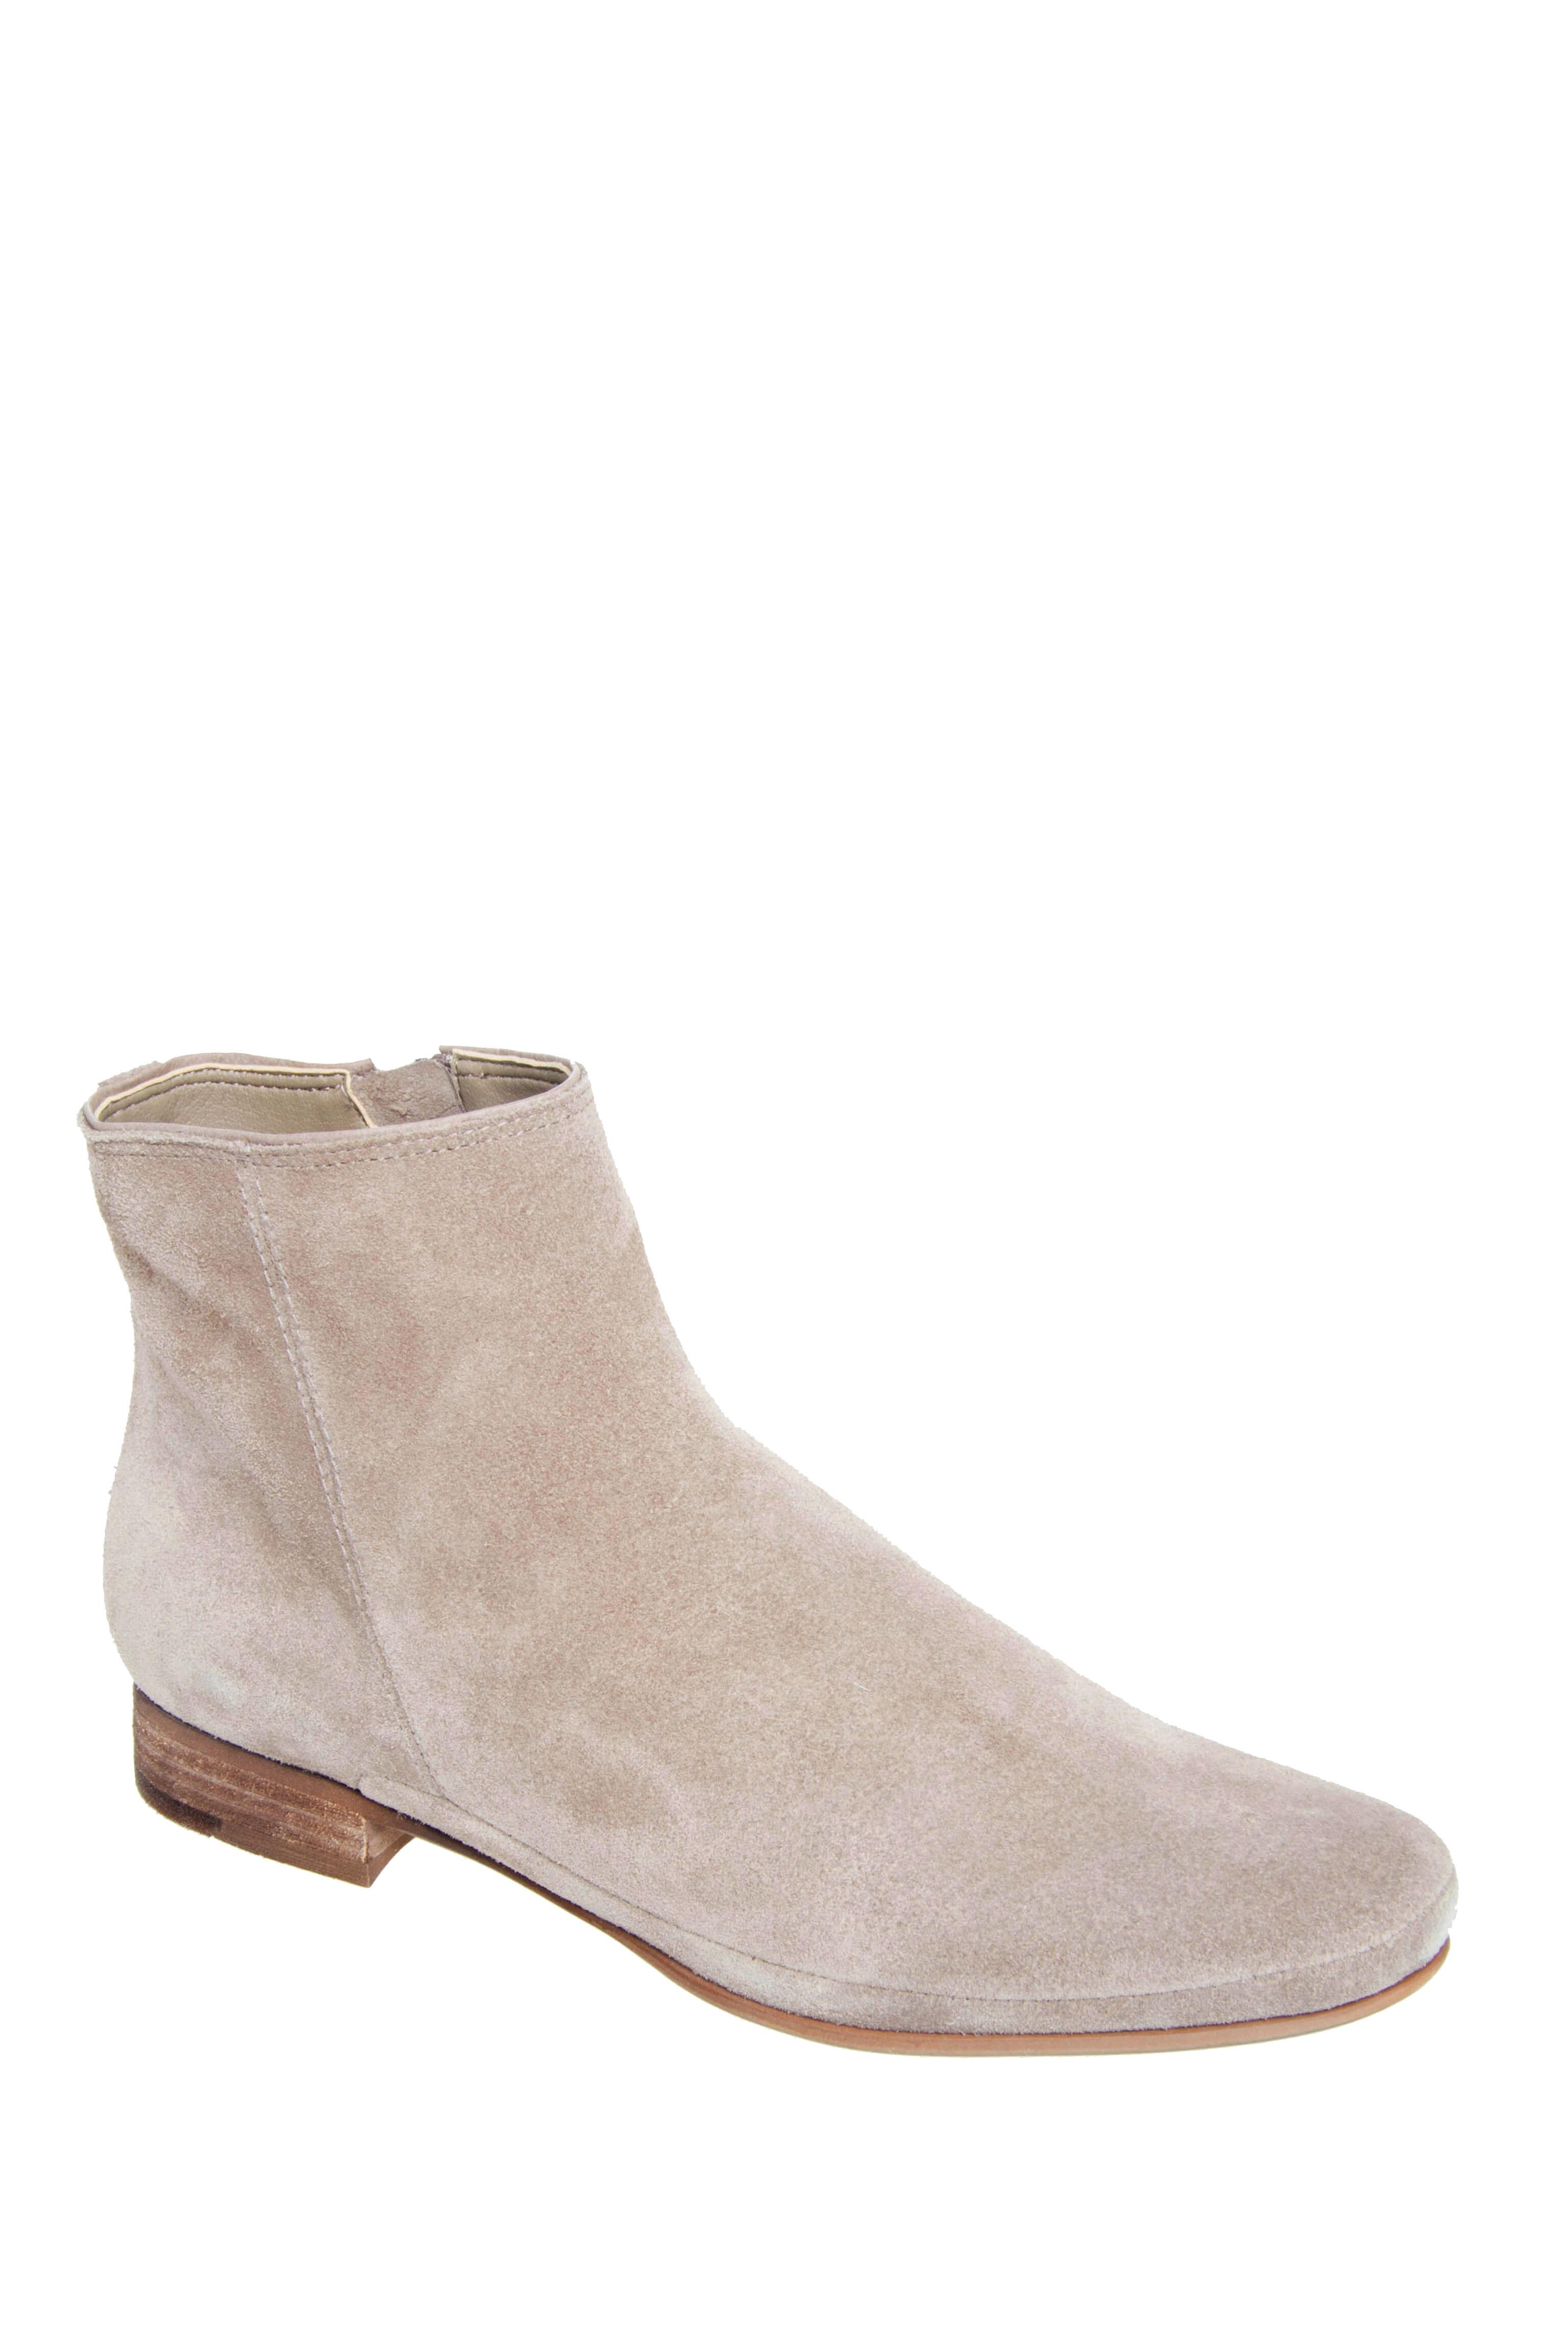 Dolce Vita Taj Low Heel Booties - Taupe Suede